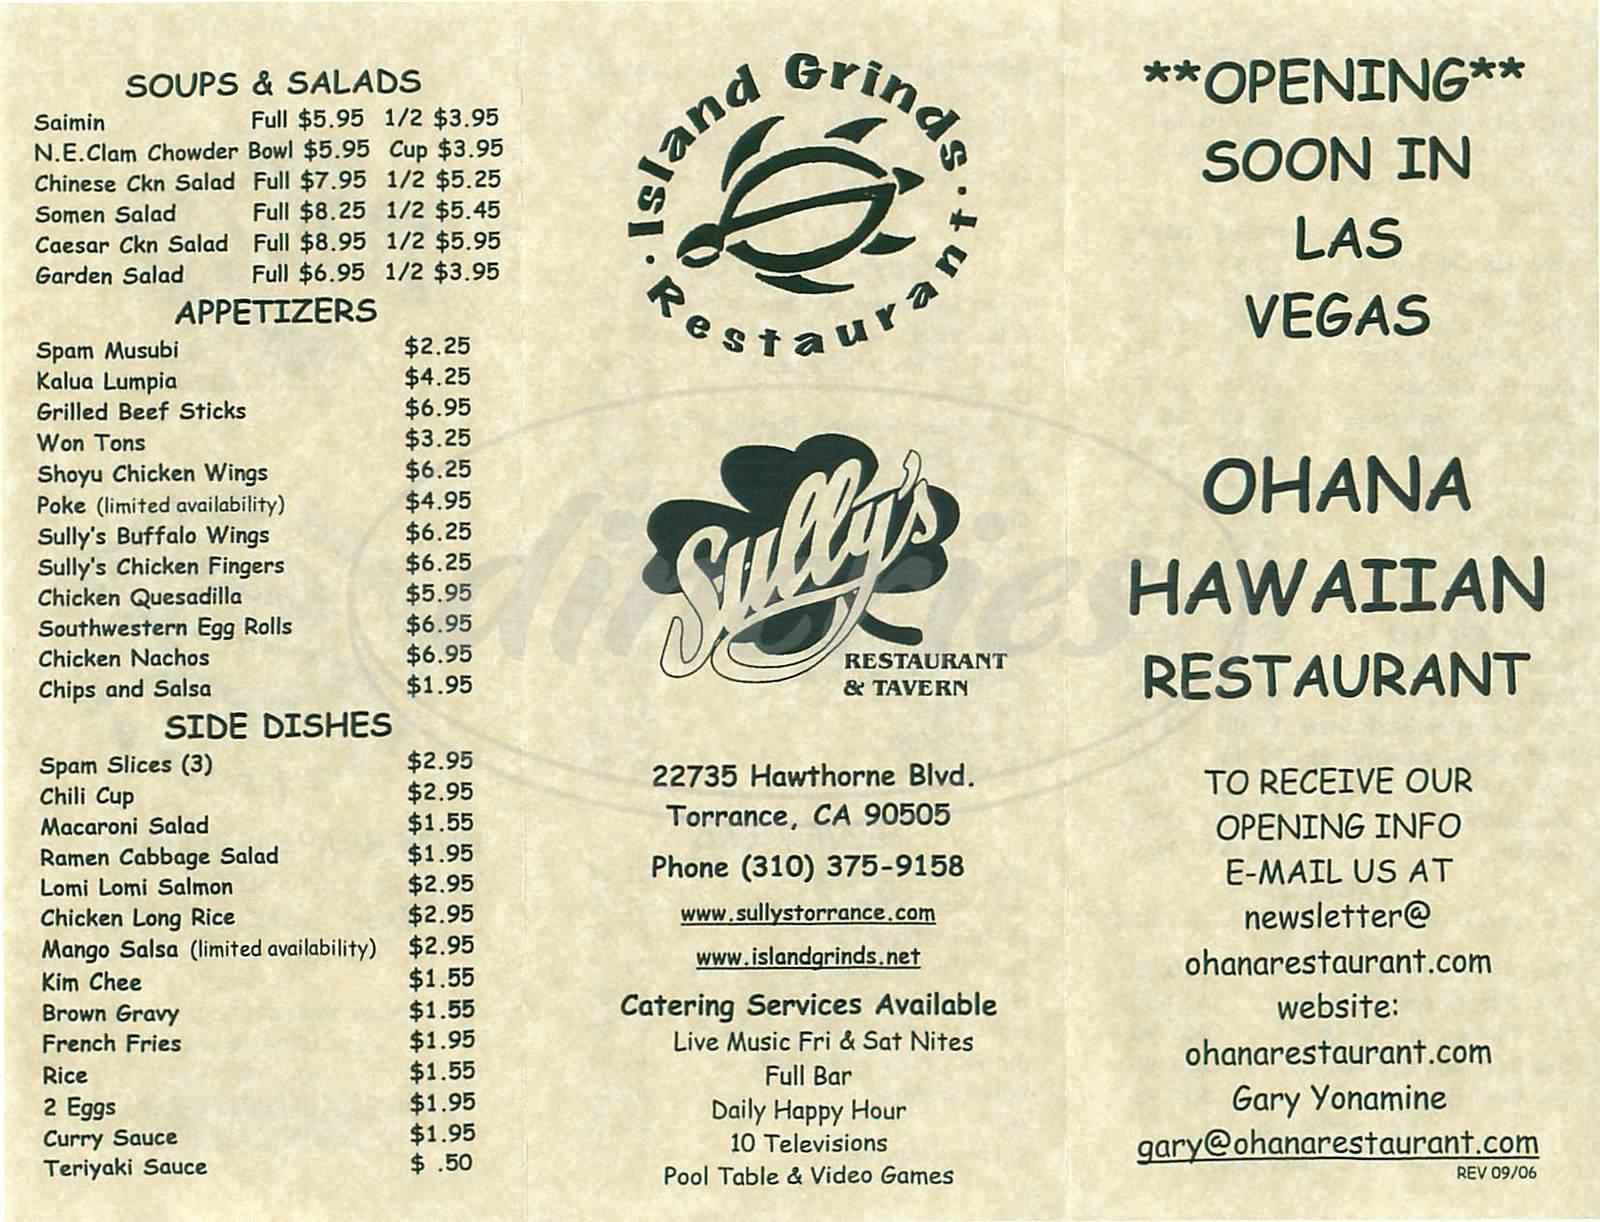 menu for Sullys Restaurant & Tavern